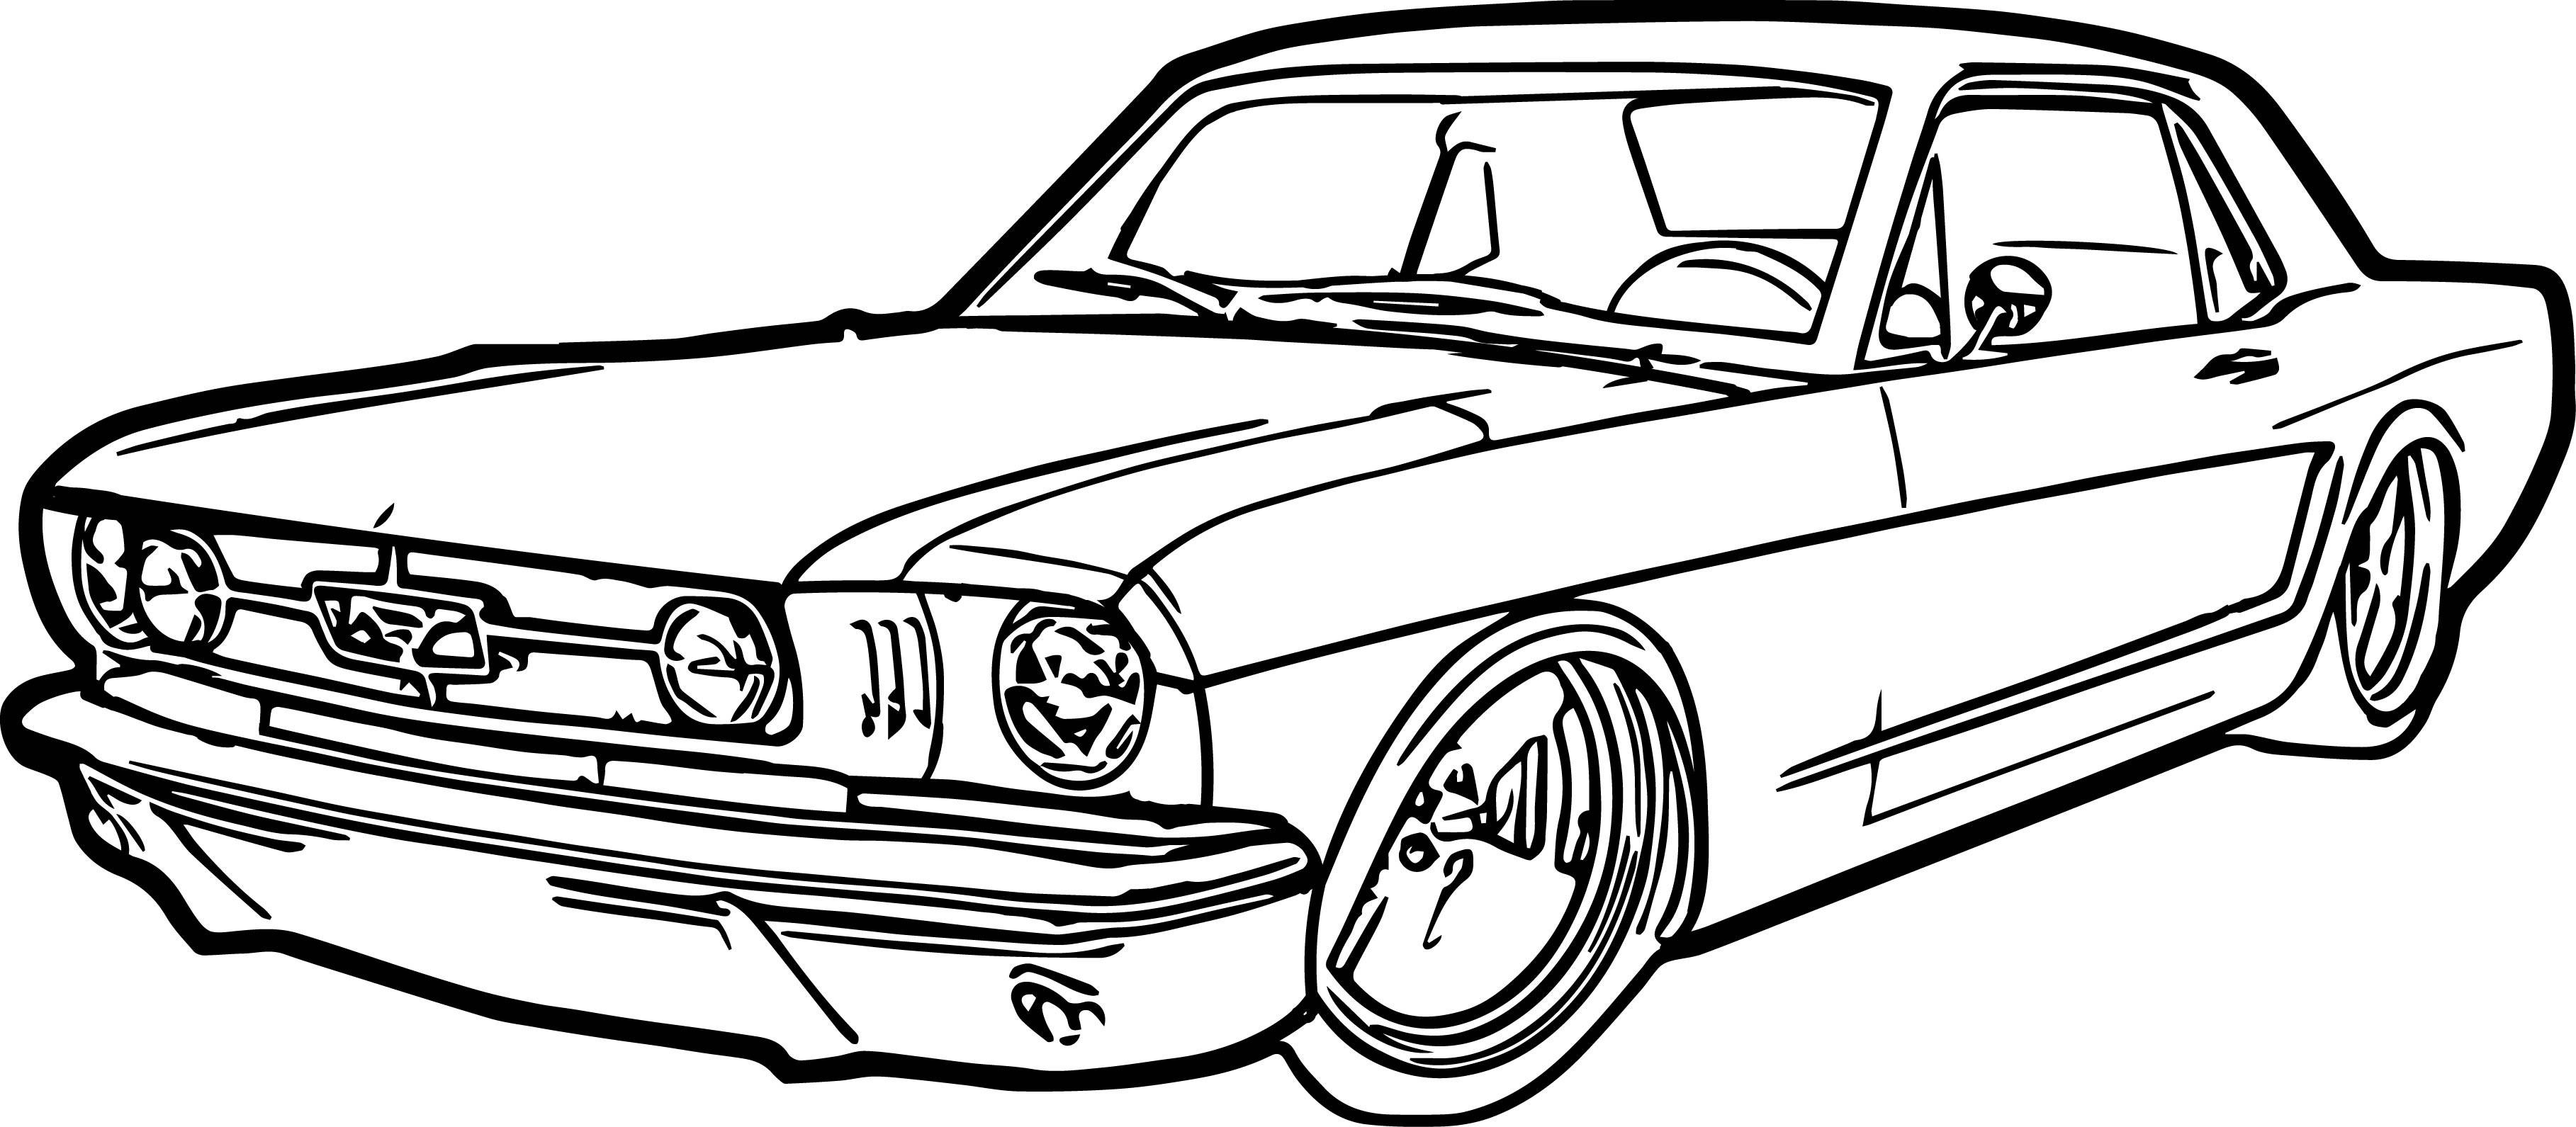 Mustang Car Drawing At Getdrawings